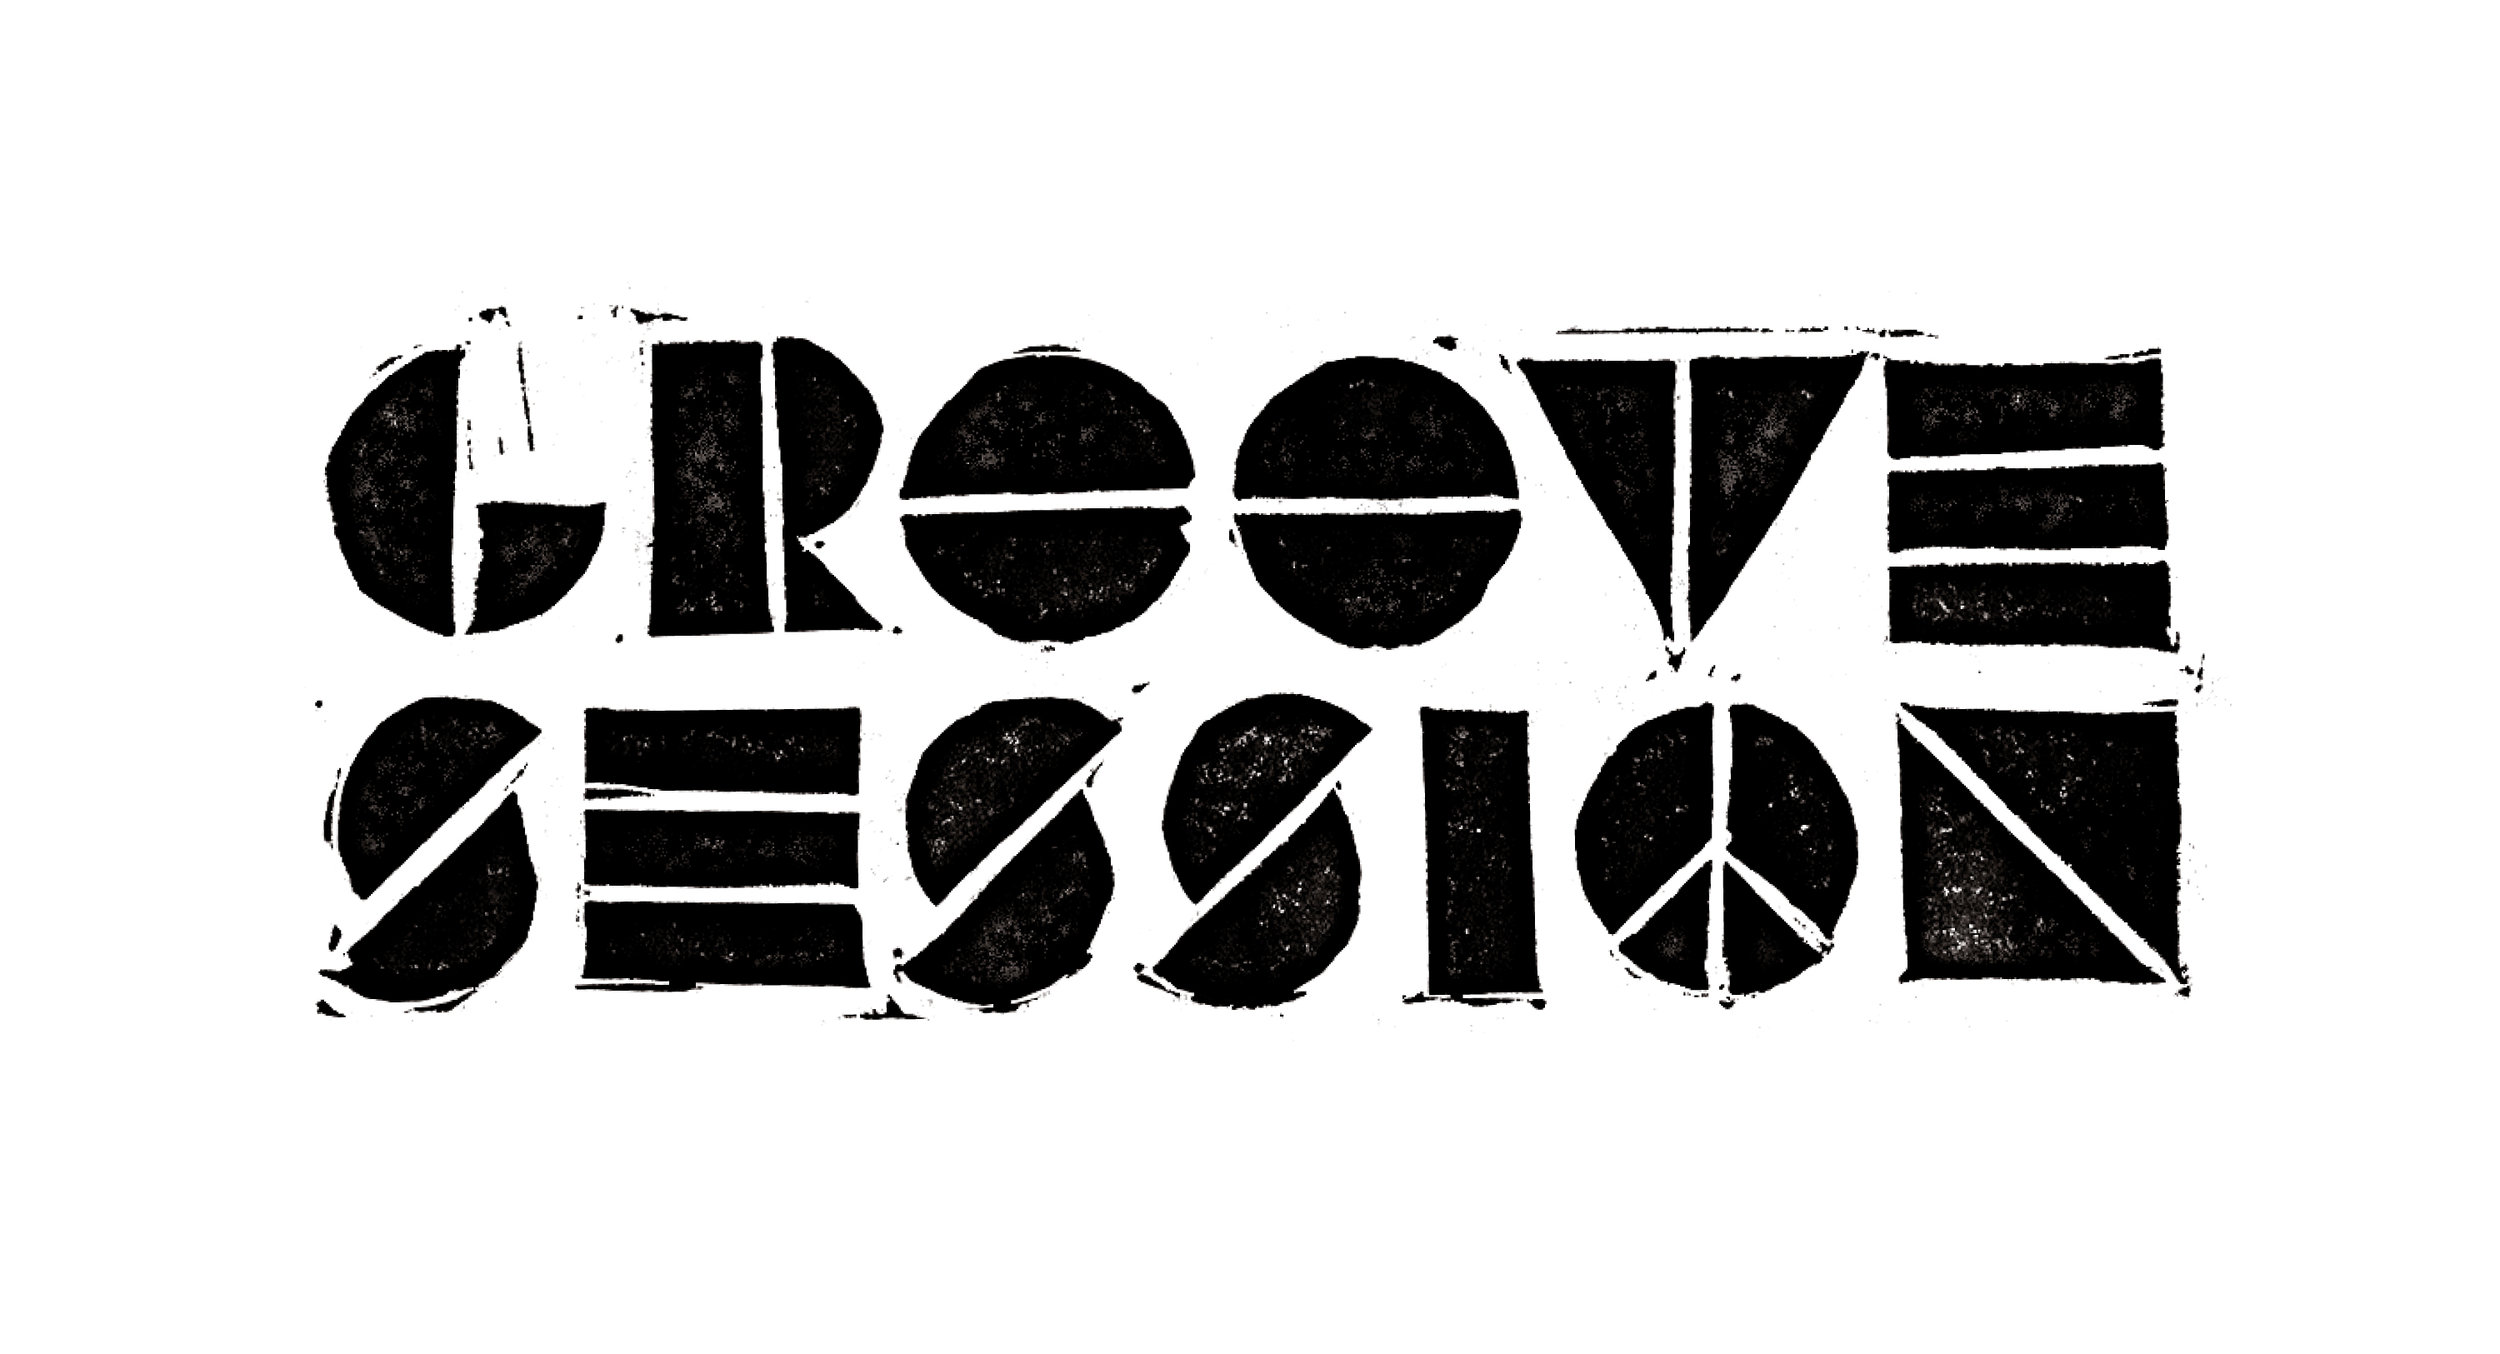 gs_logo_stacked_bw.jpg